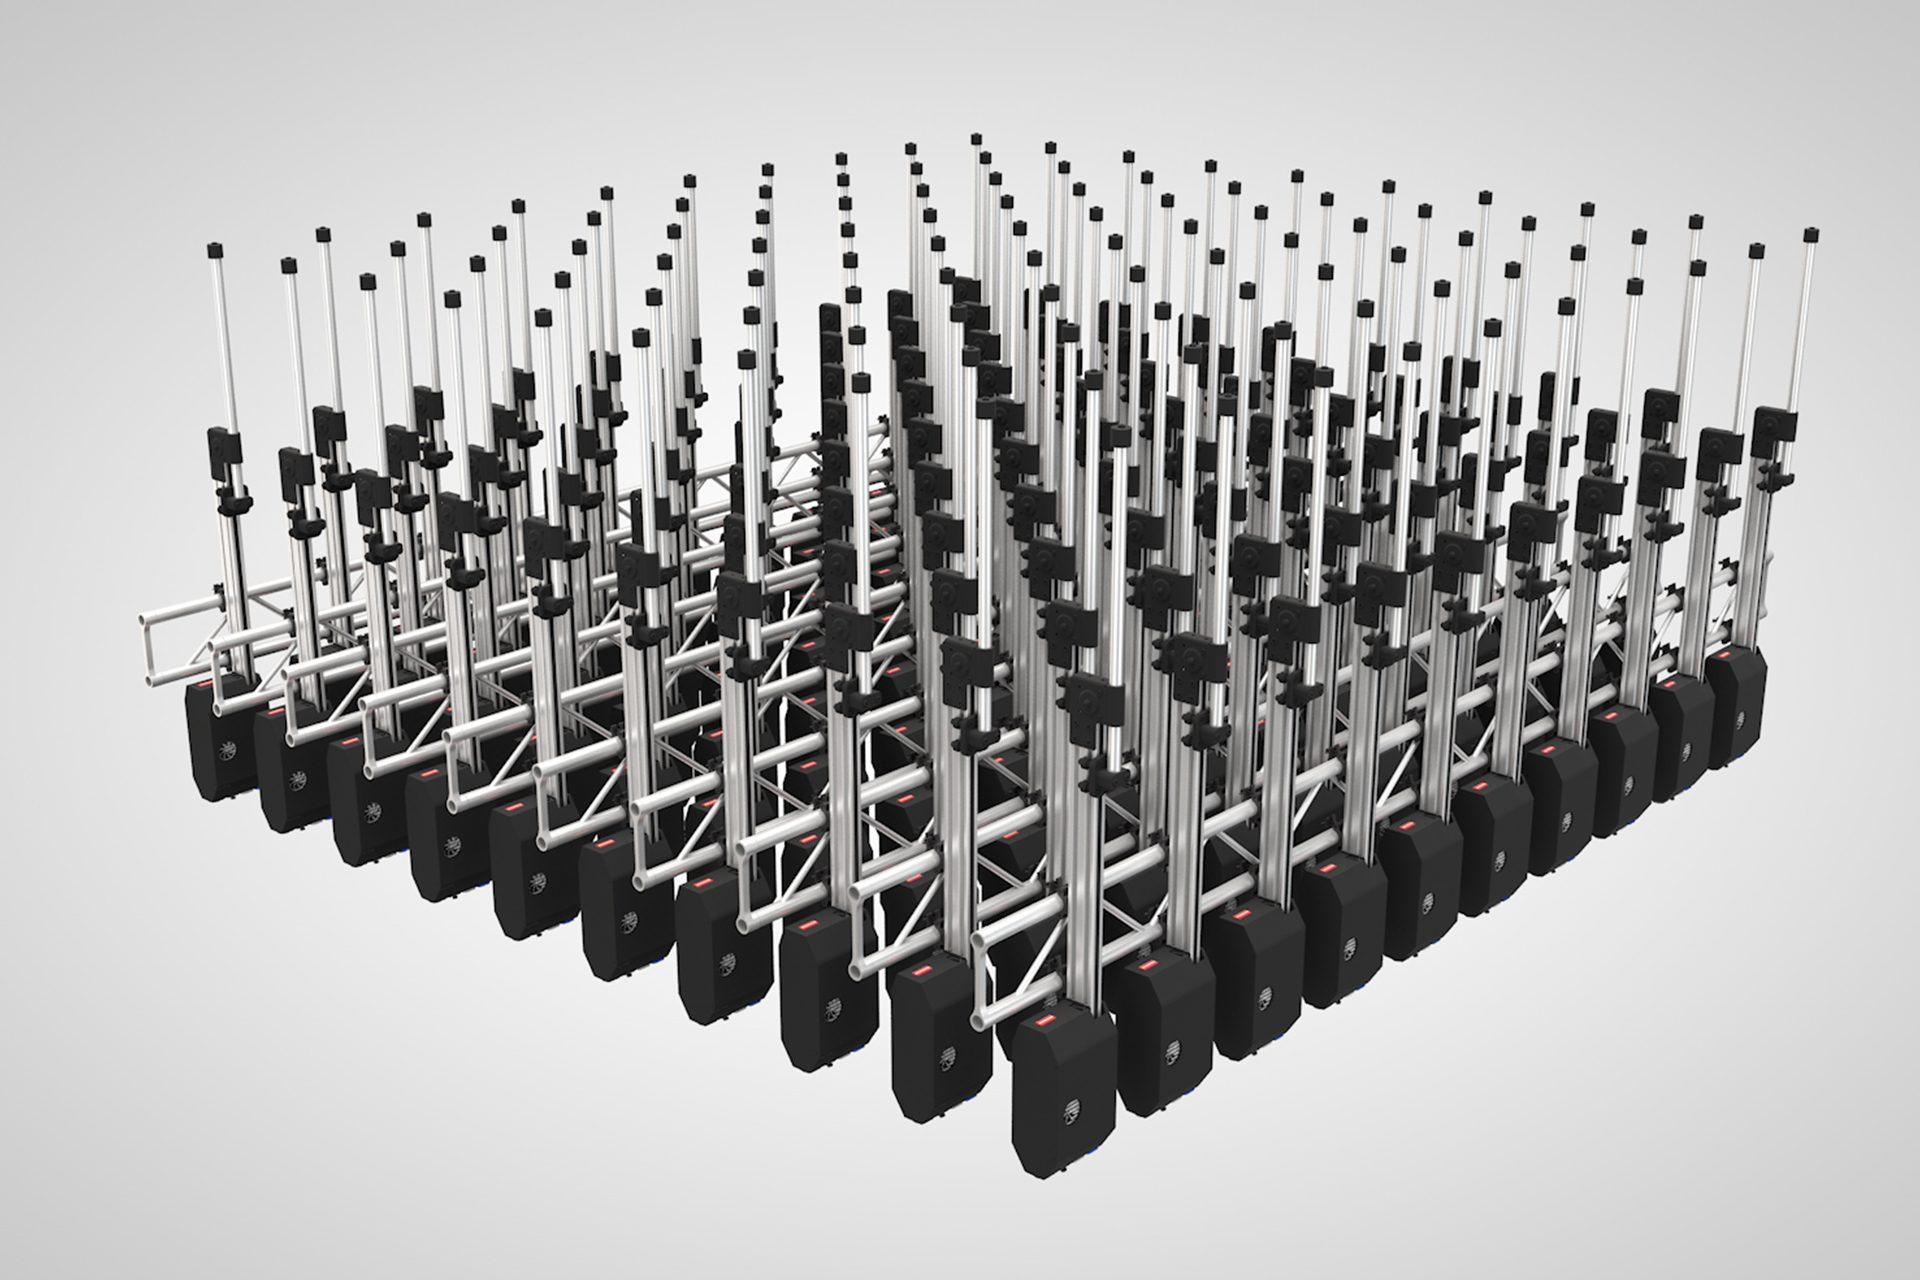 dmx-linear-actuator-render